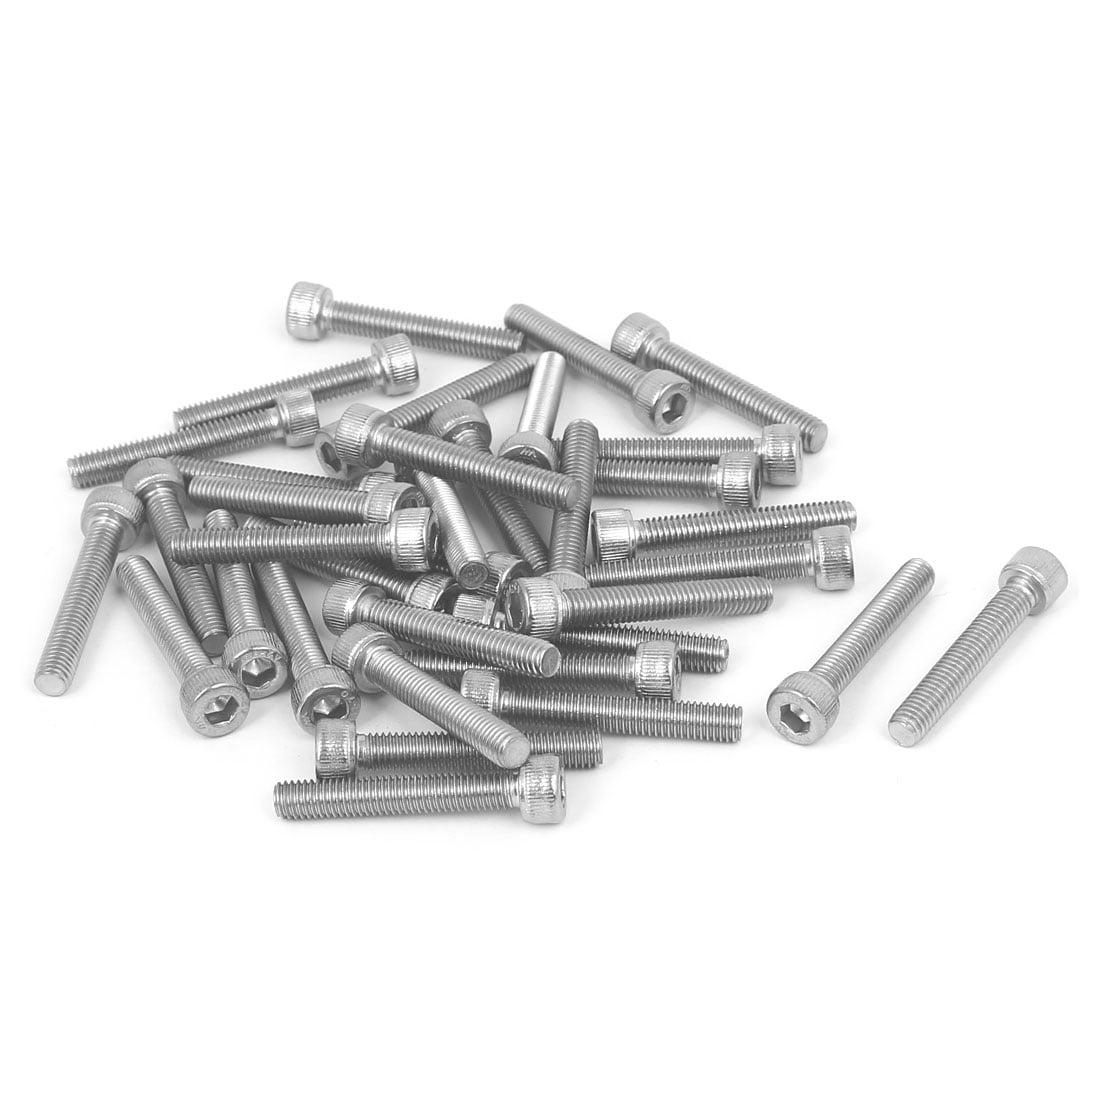 M5x30mm Thread 304 Stainless Steel Hex Socket Head Cap Screw Bolt DIN912 35pcs - image 4 of 4